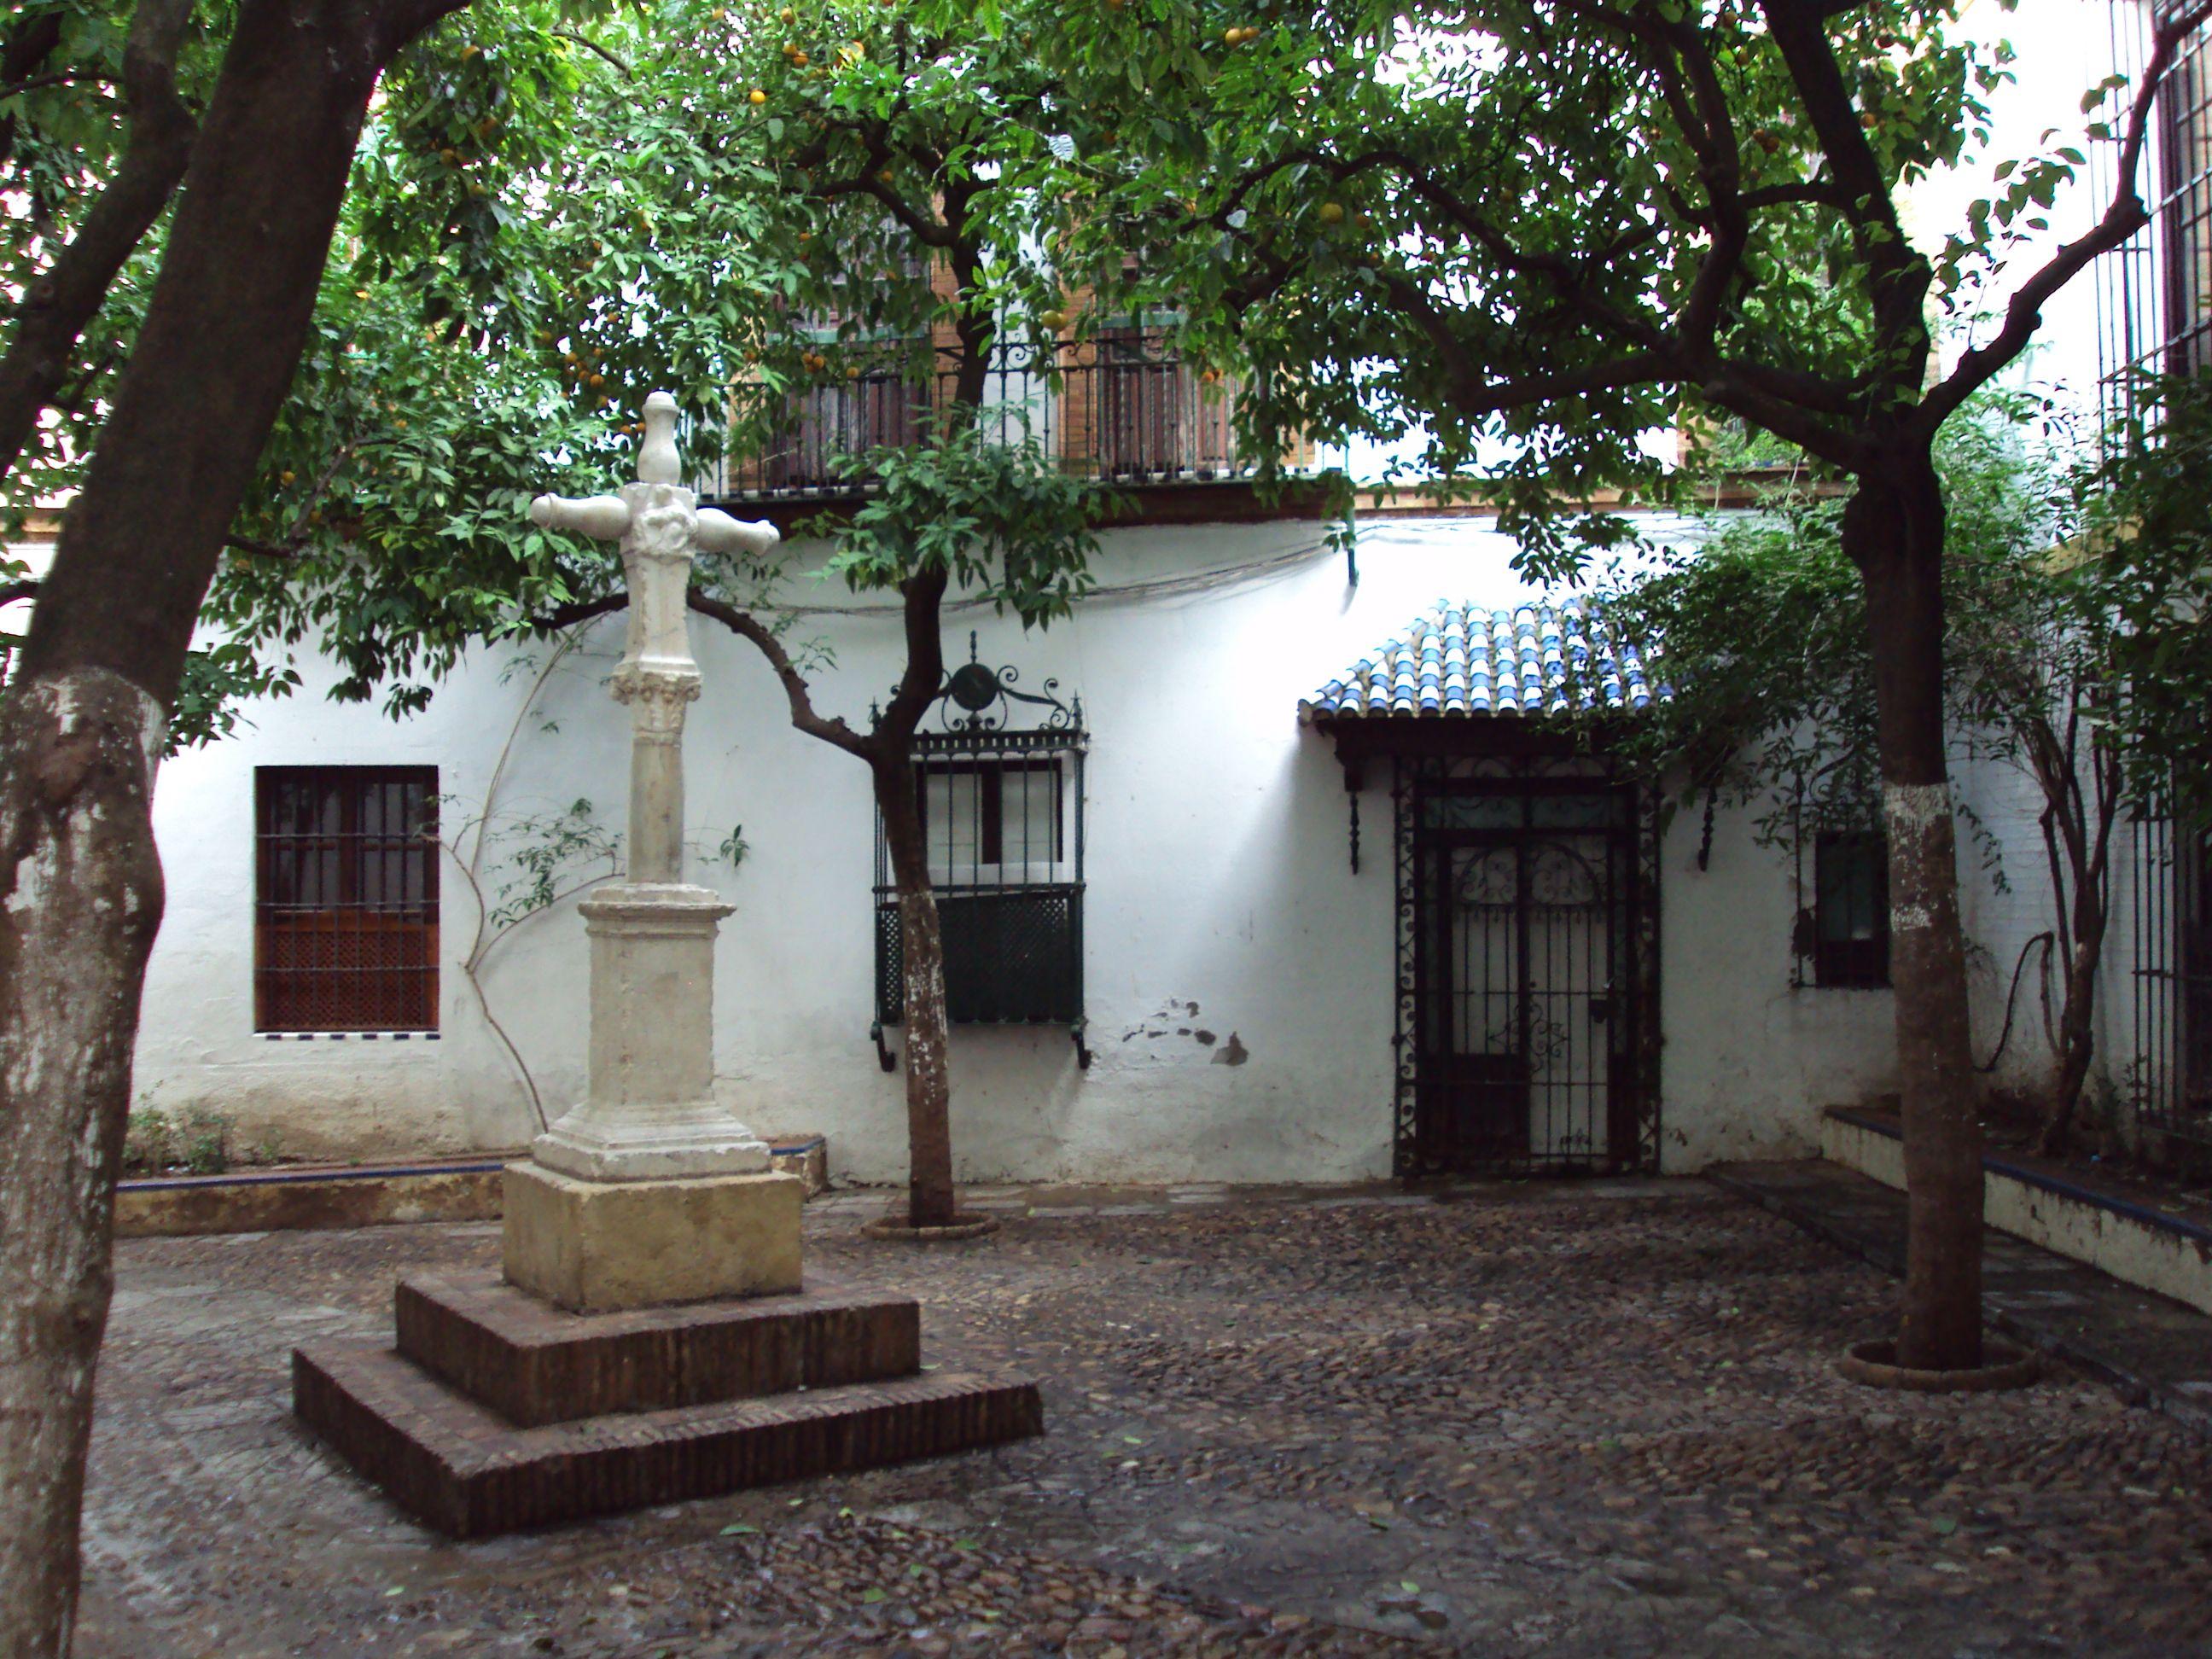 Plazuela De Santa Marta In Seville Spain Sevilla Andalucia